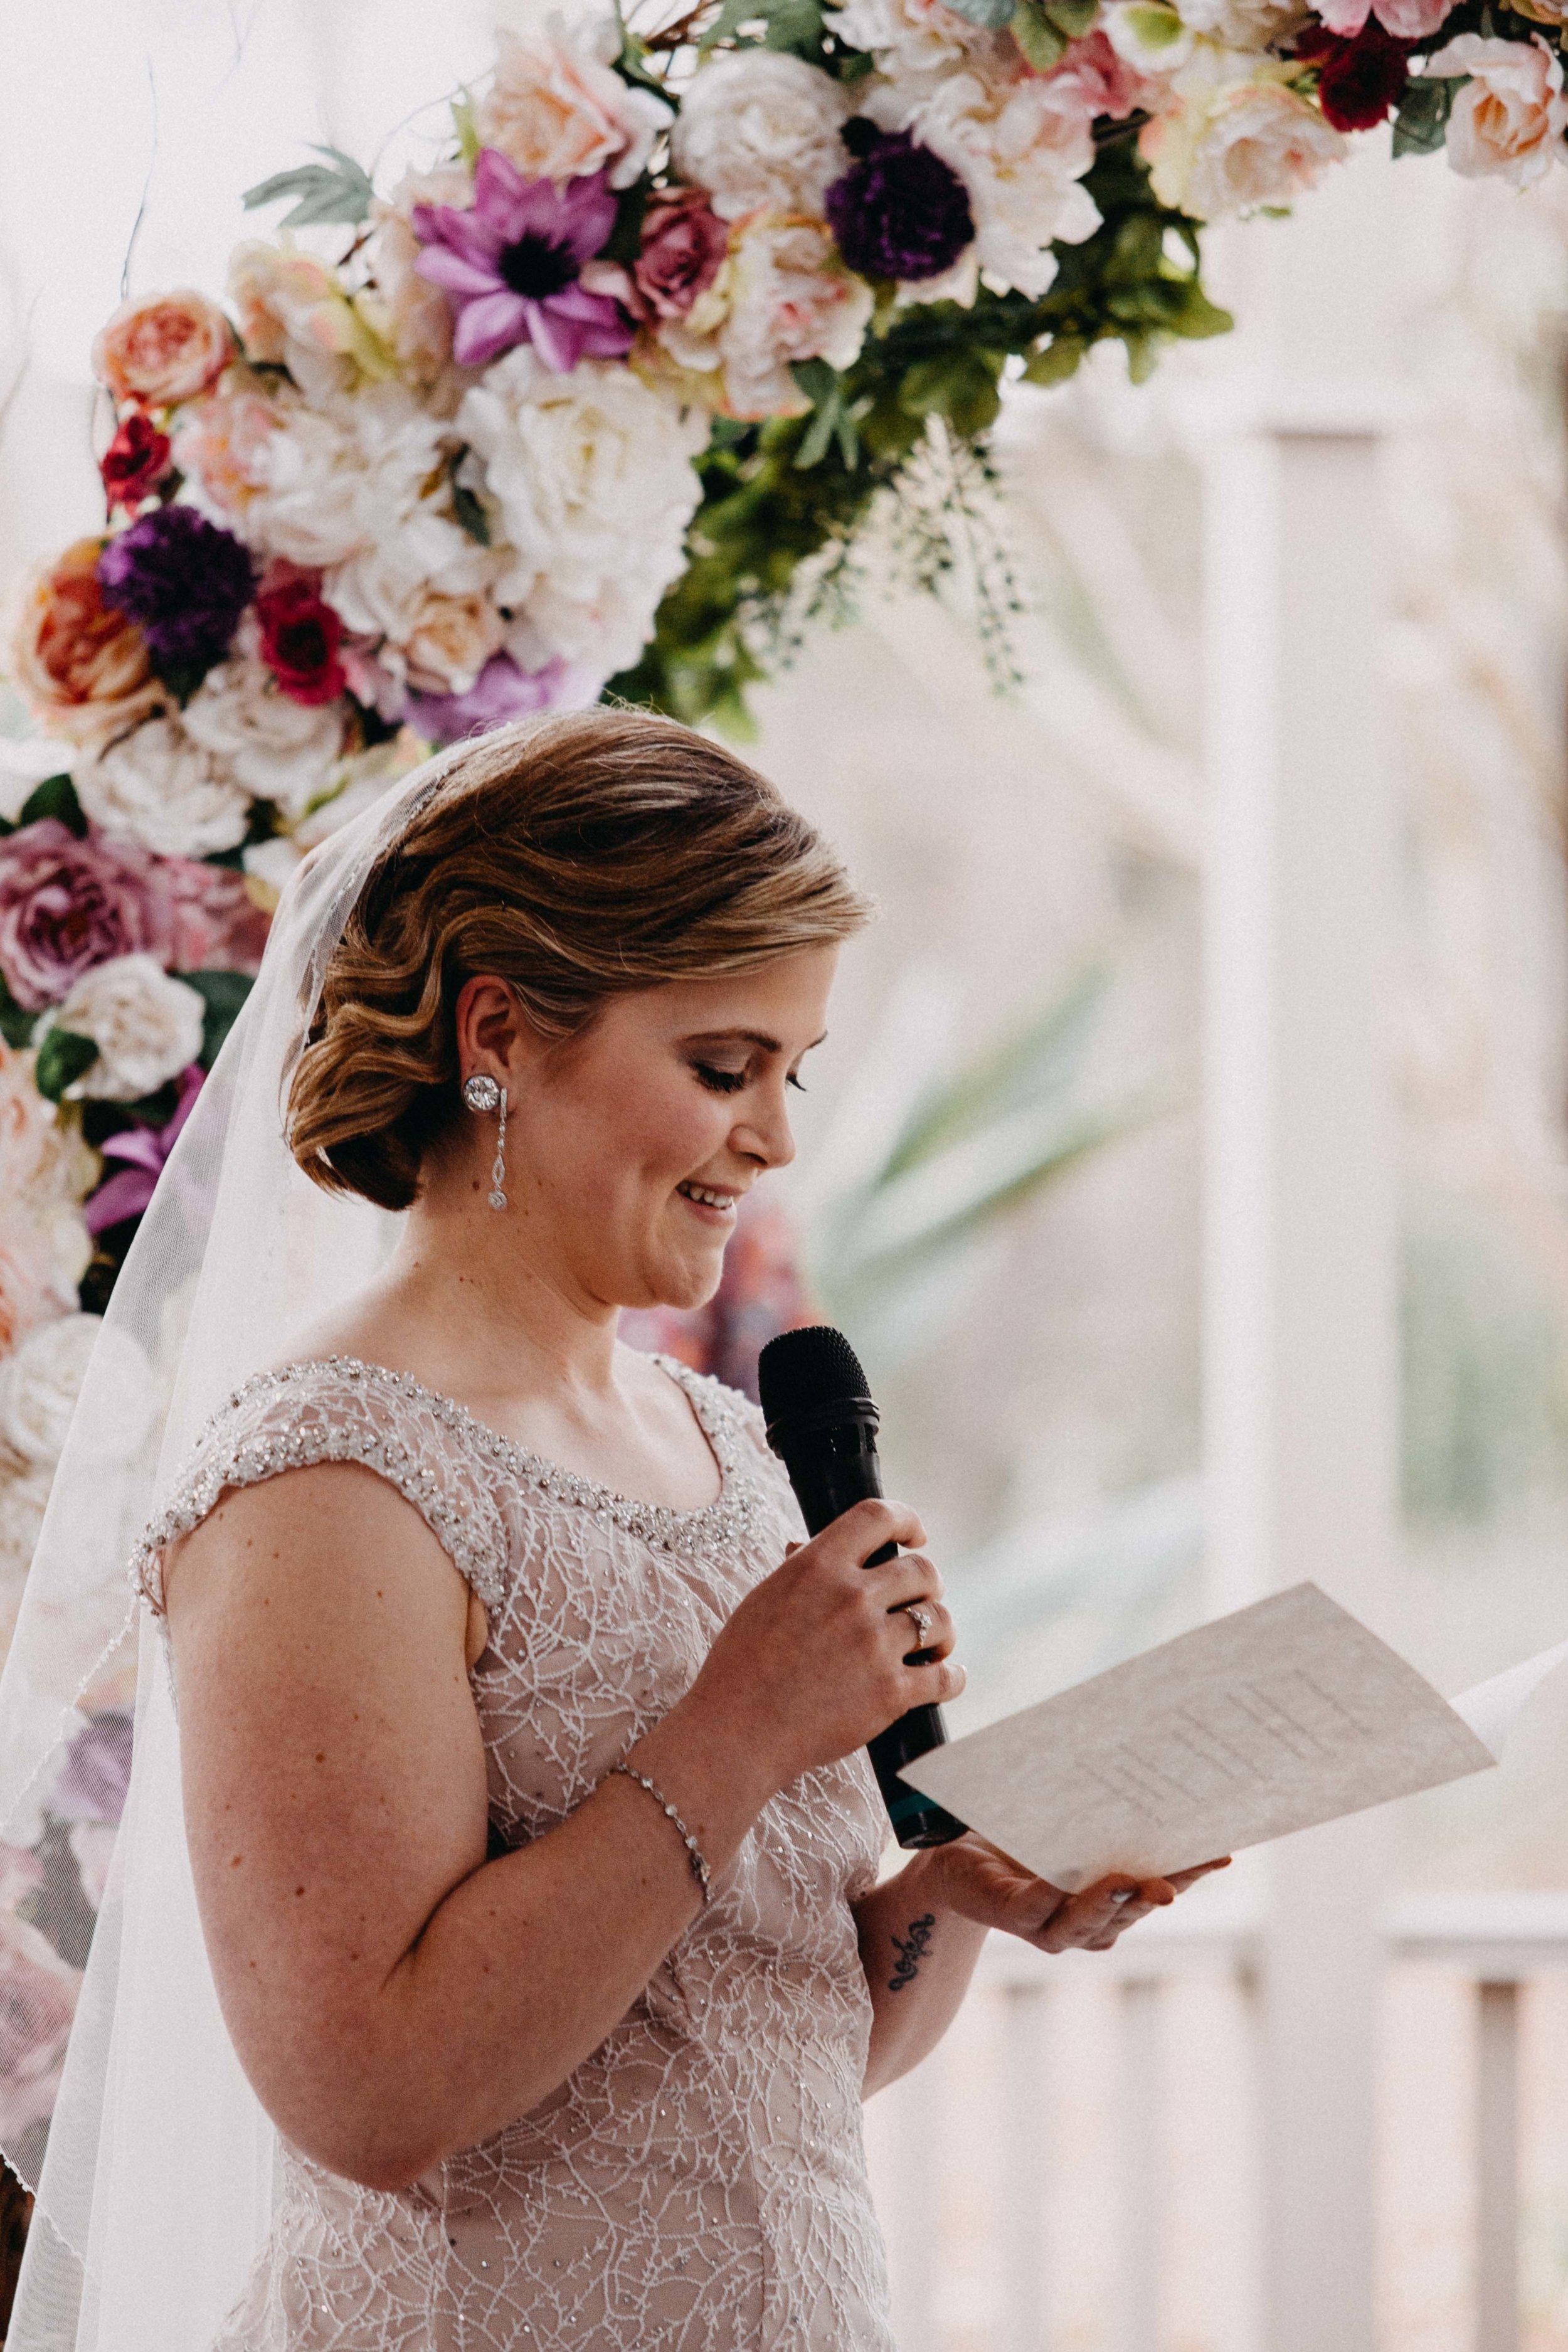 appin-house-wedding-macarthur-www.emilyobrienphotography.net-82.jpg